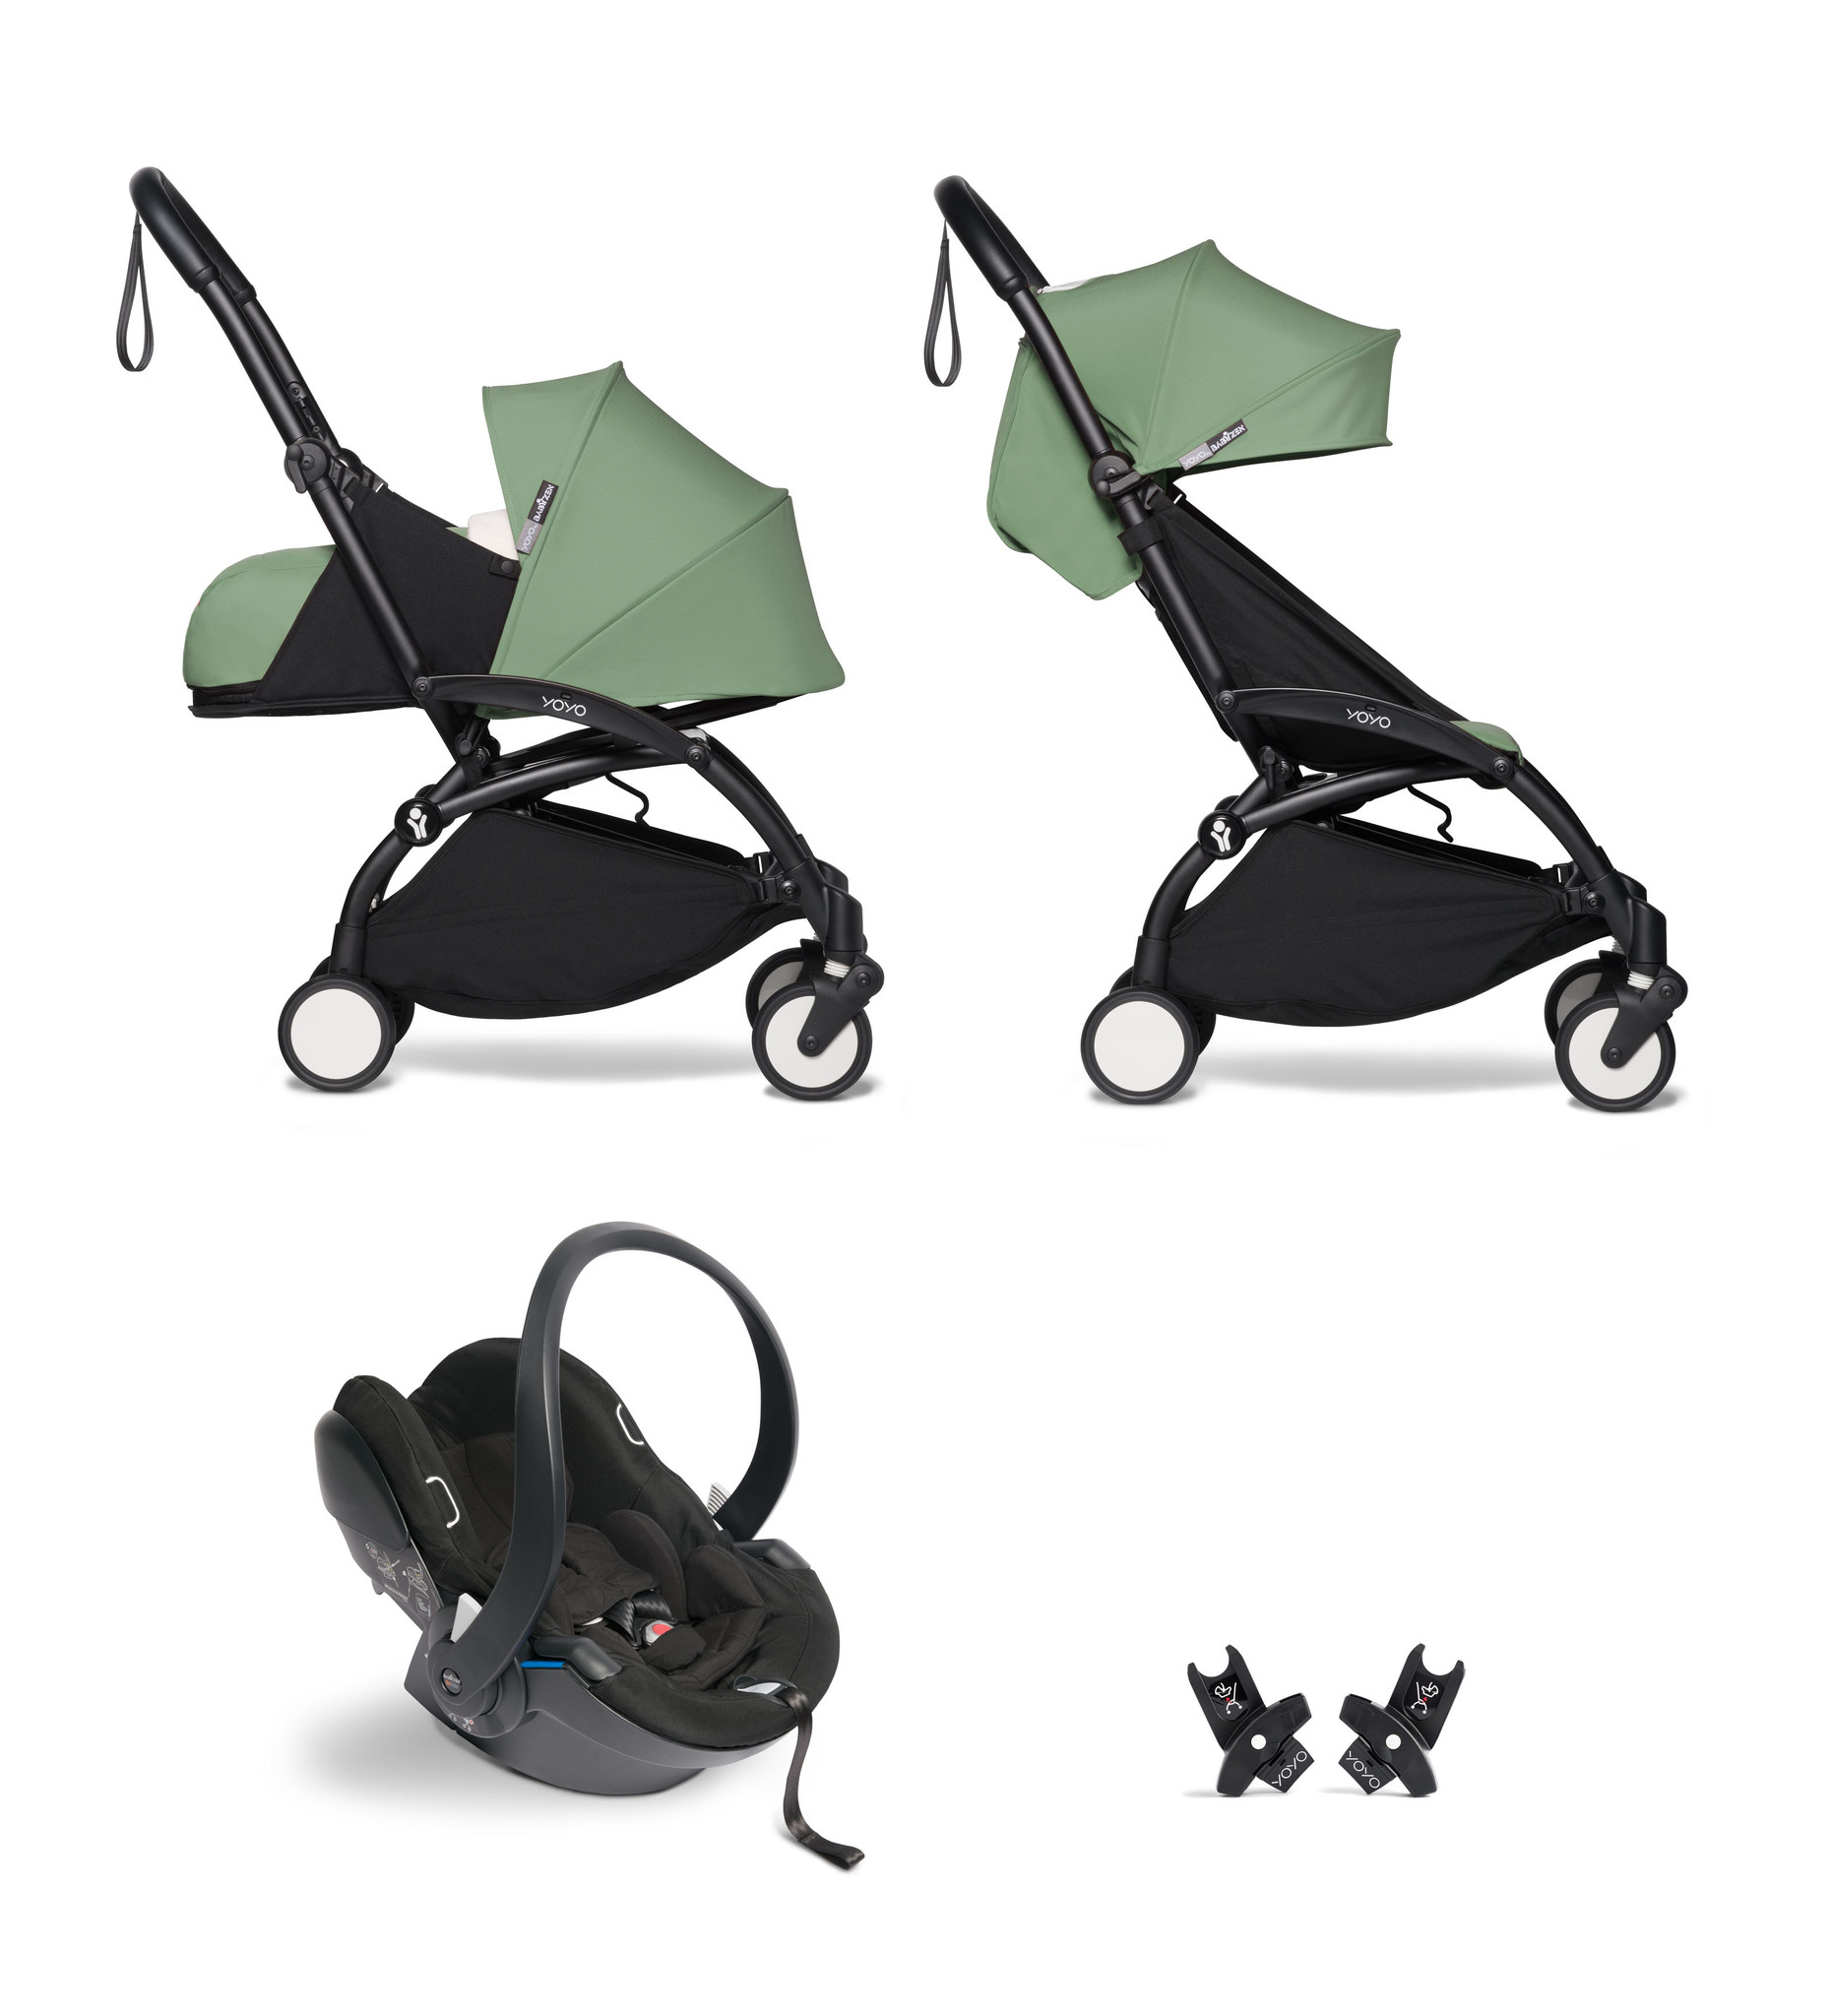 Babyzen Babyzen YOYO² buggy COMPLEET / FULL SET 0+ and 6+ peppermint frame zwart incl. YOYO² BeSafe autostoel zwart